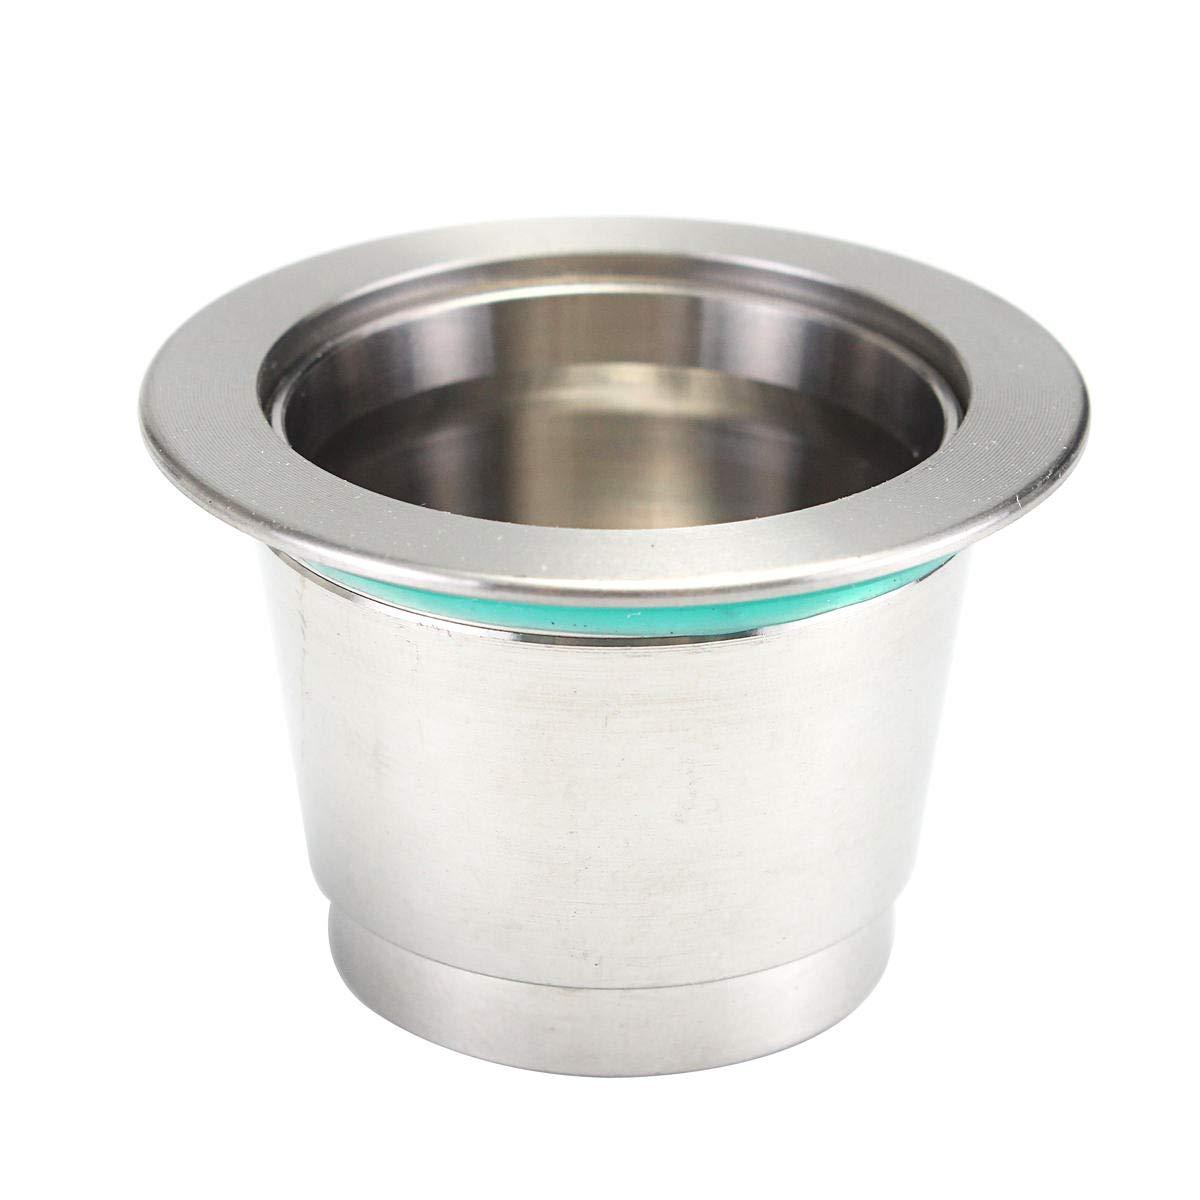 Super Fine Metal Refillable Capsule Pod For illy Coffee Nespresso Machine - Tools, Industrial & Scientific Hardware & Accessories - 1 x Steel capsule